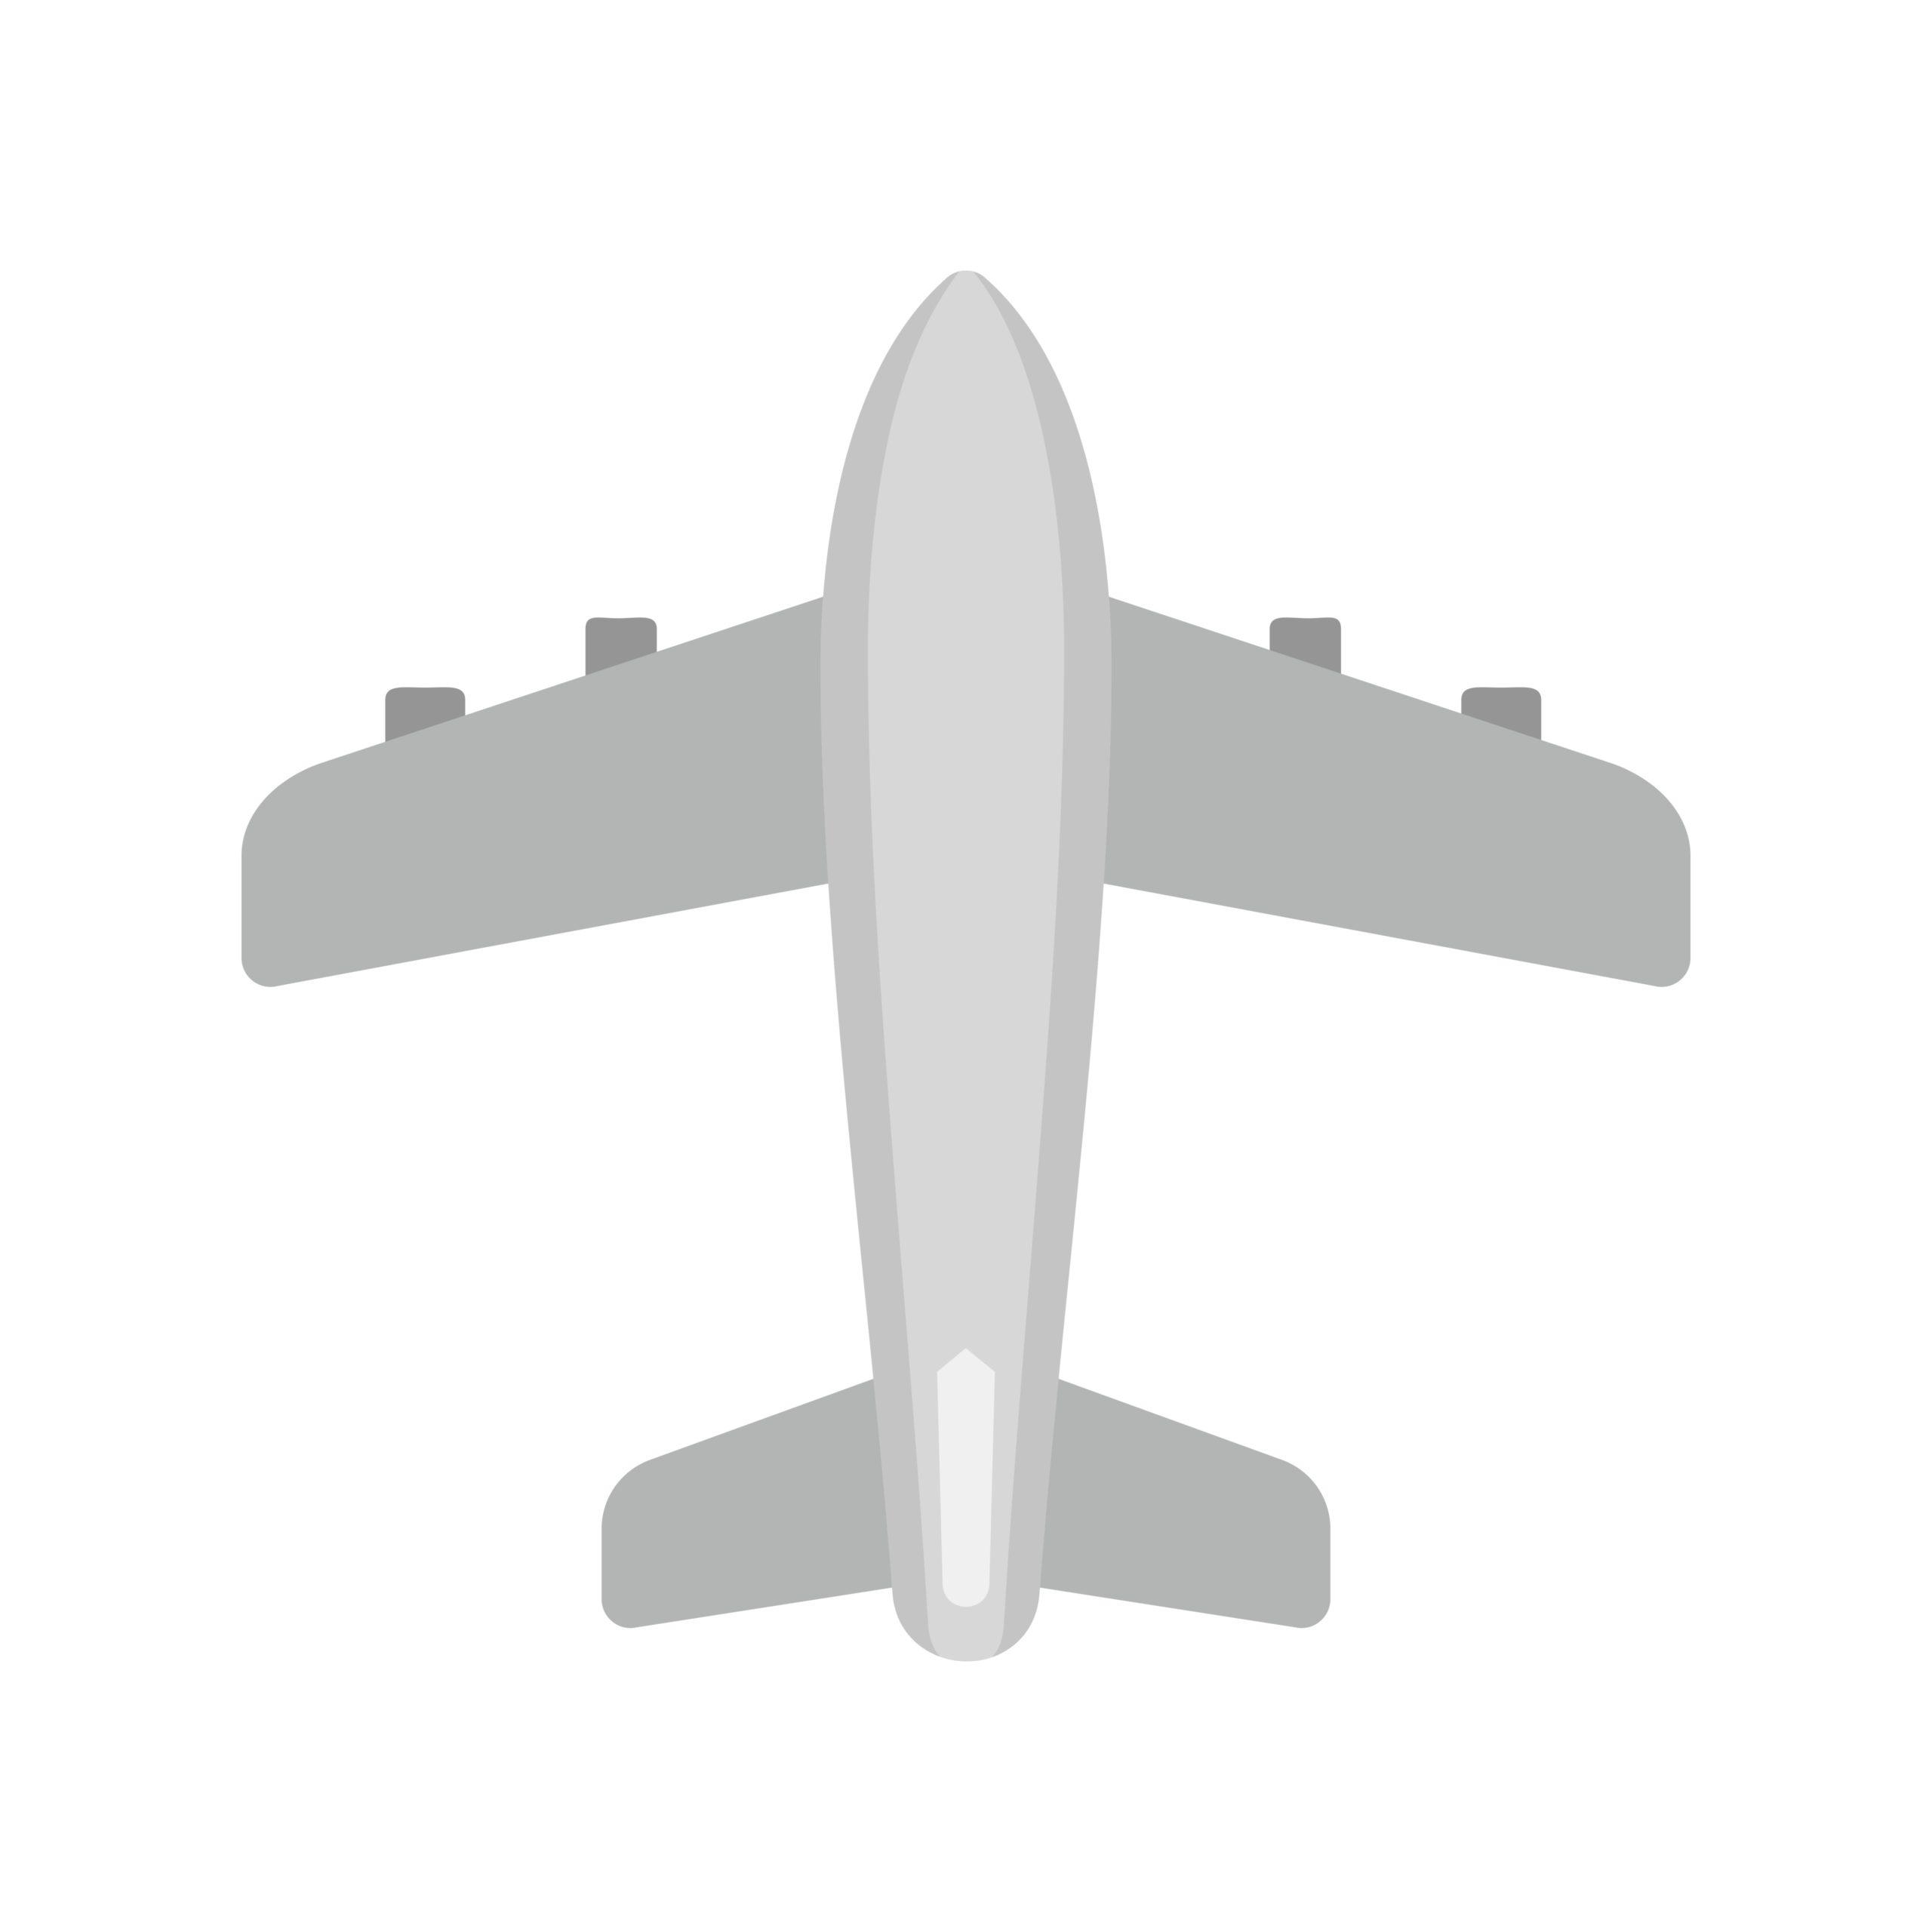 5444 - Aeroplane